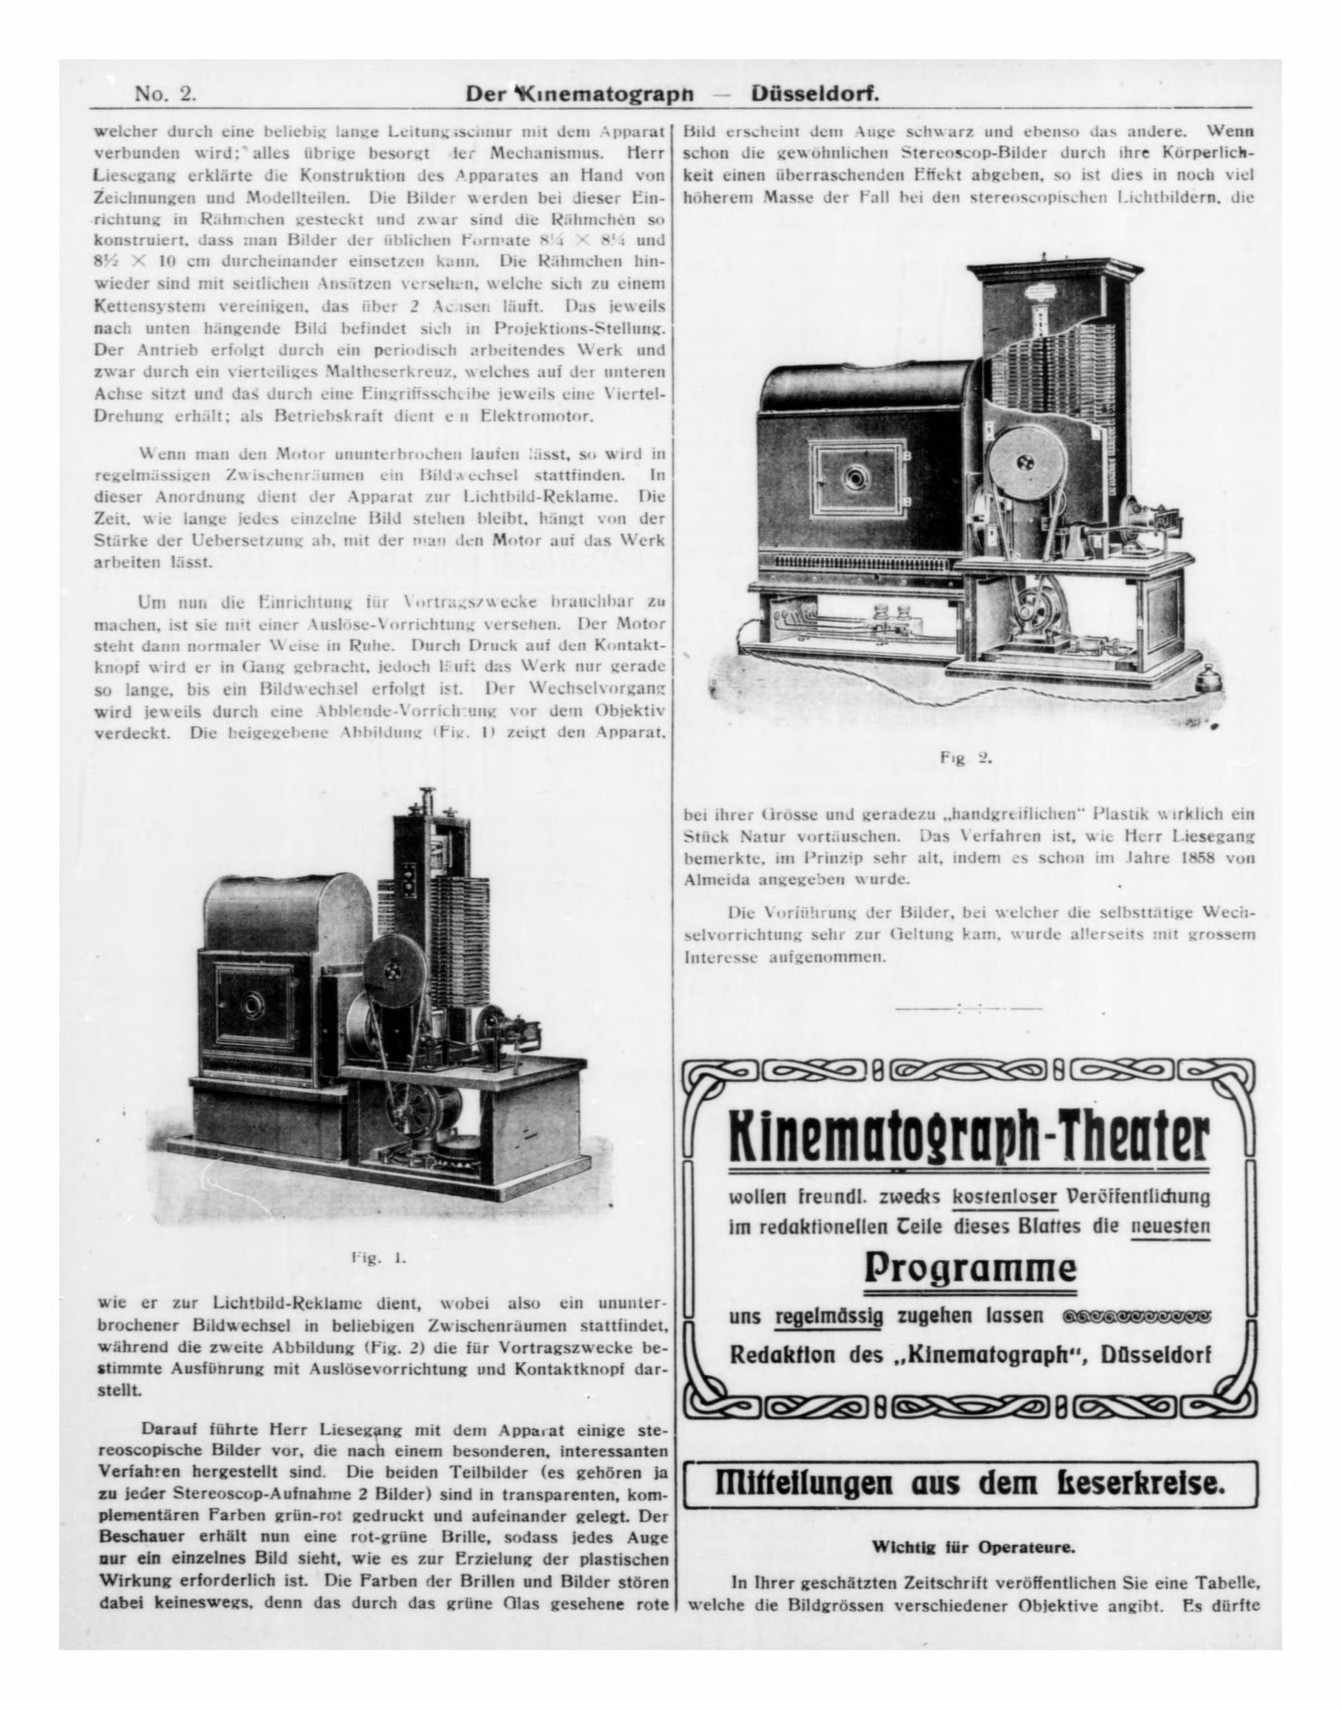 Kinematograph01-1907-01_jp2.zip&file=kinematograph01-1907-01_jp2%2fkinematograph01-1907-01_0029